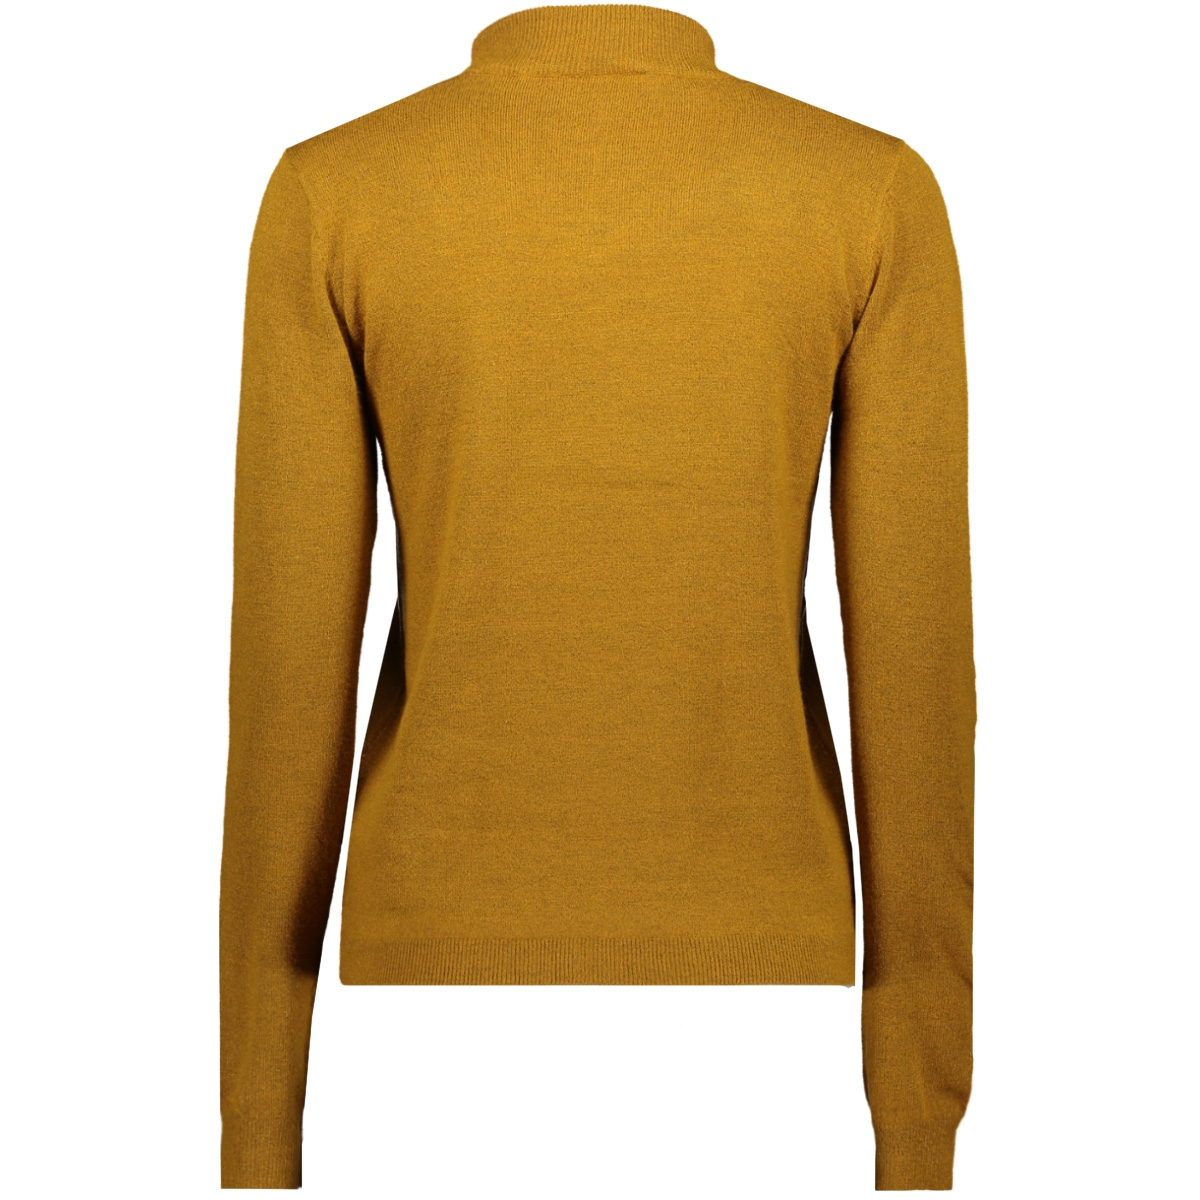 objthess l/s knit pullover seasonal 23030218 object trui buckthorn brown